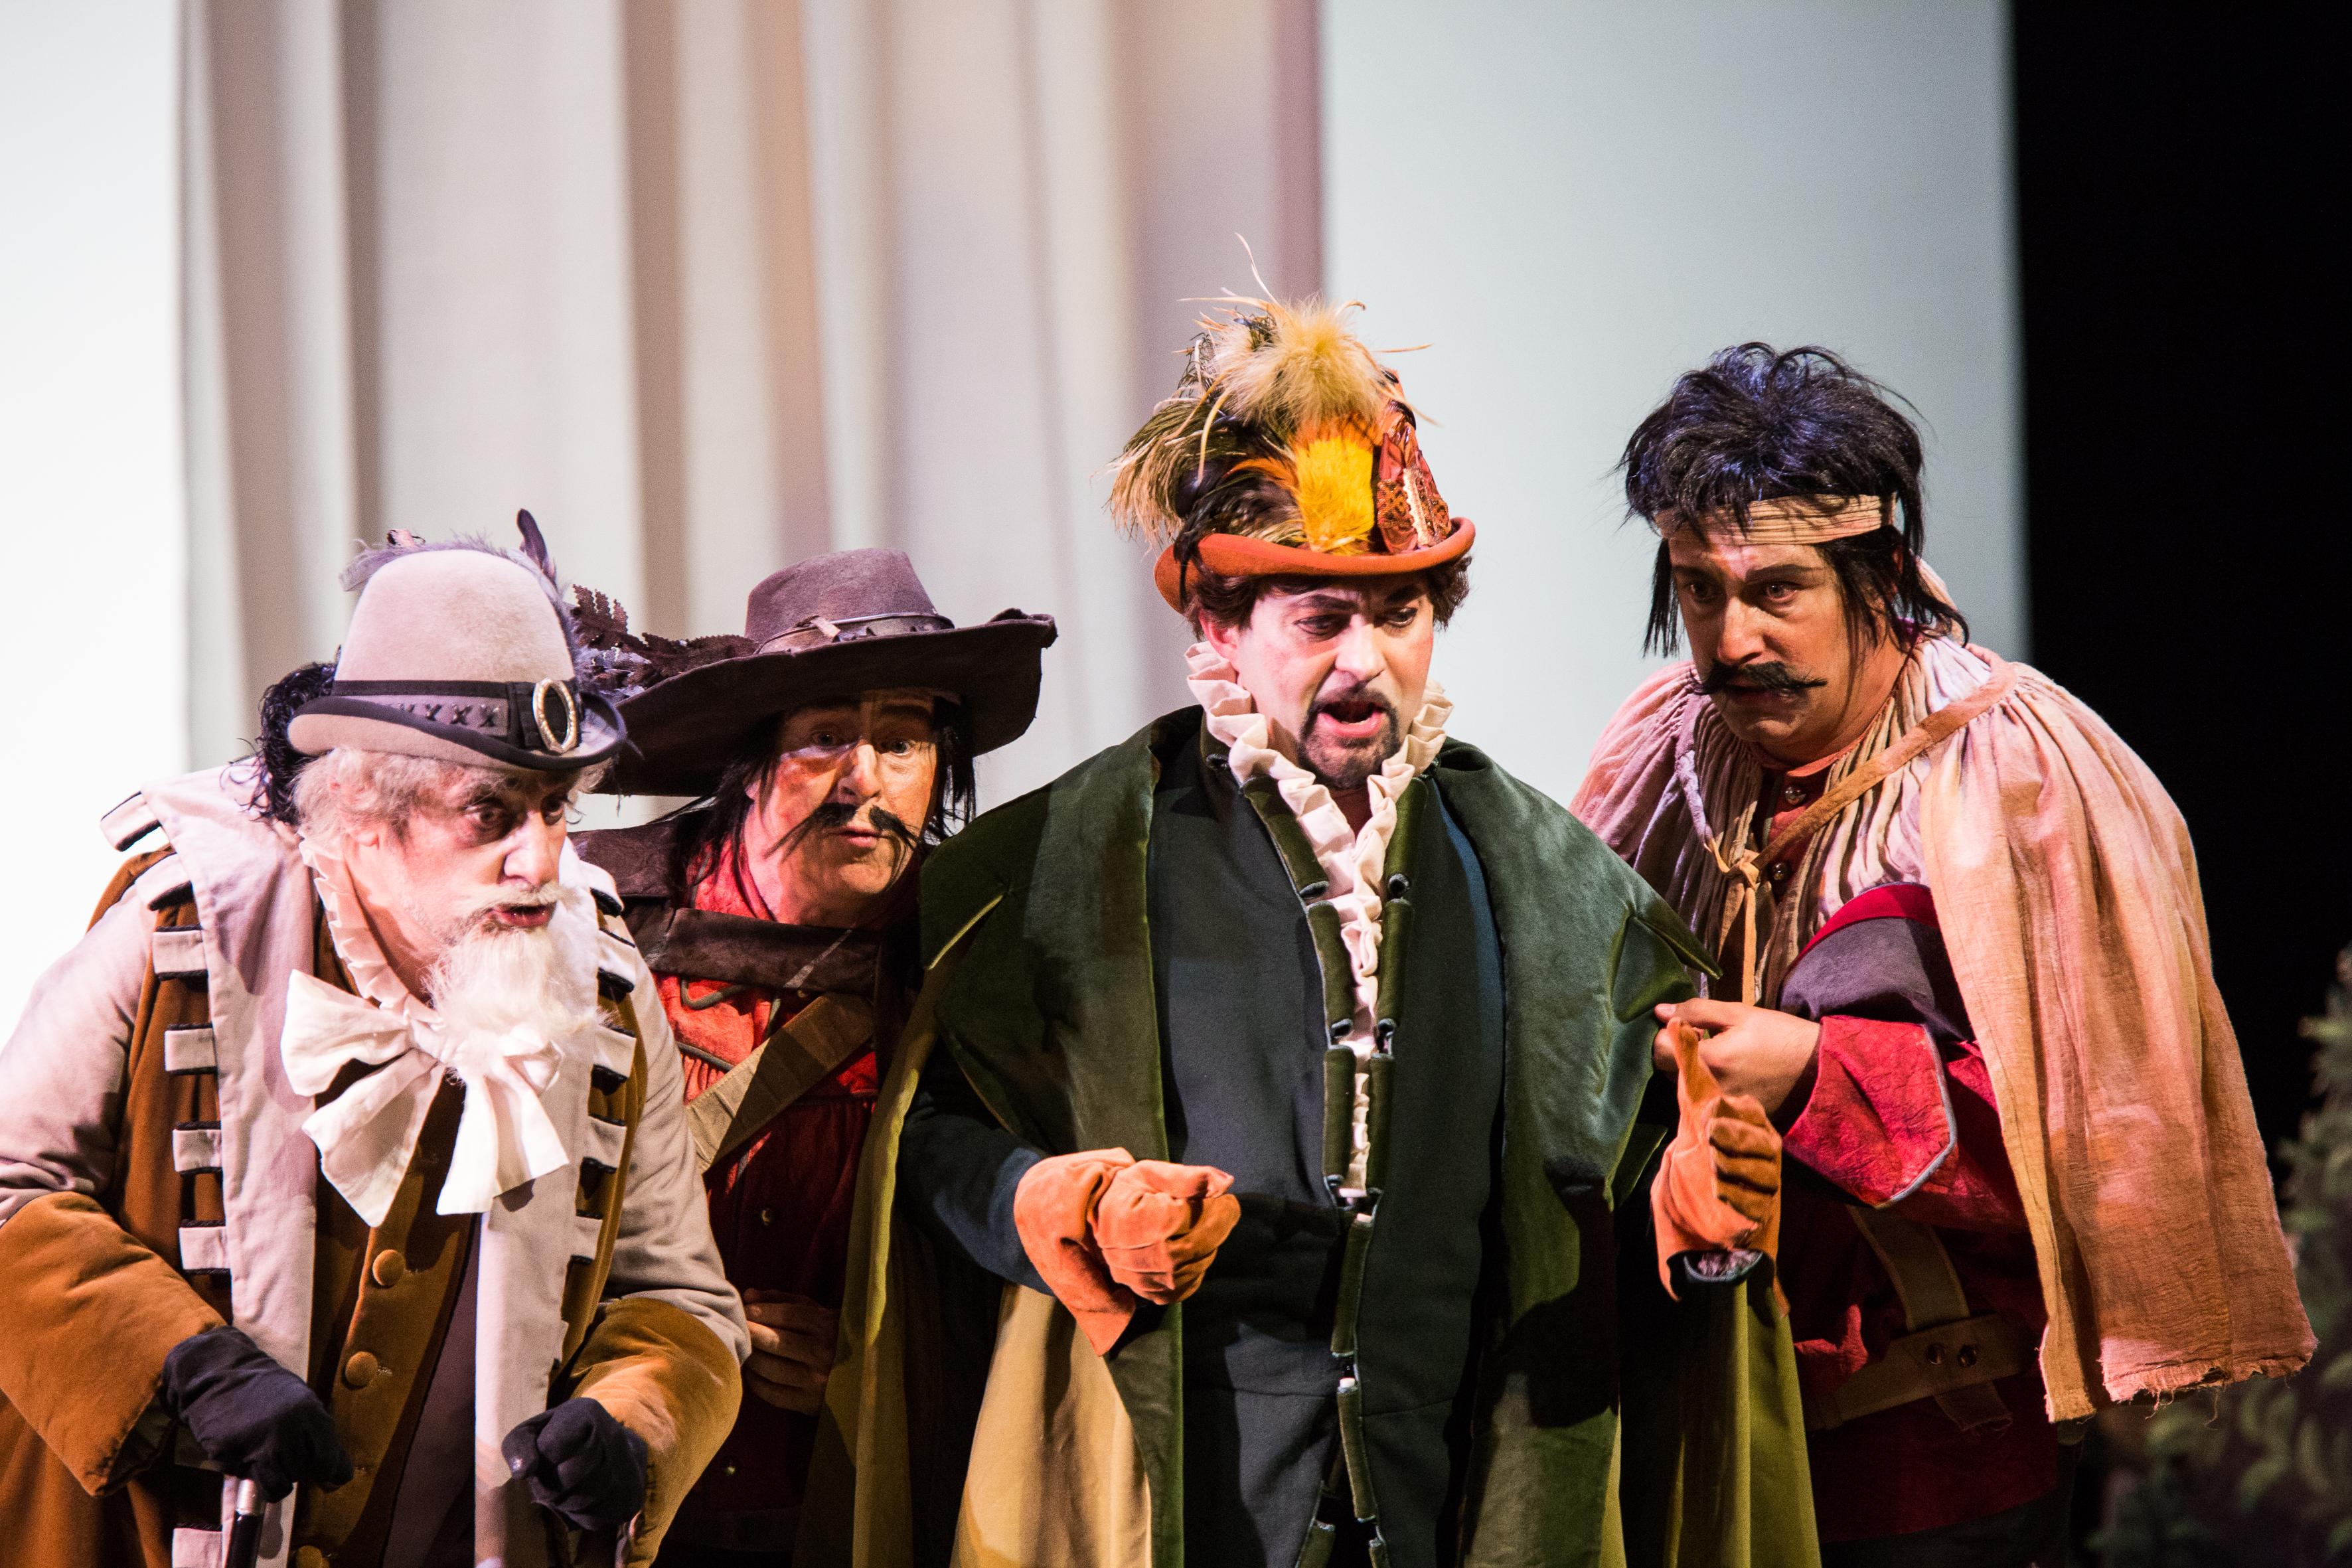 Pistola, teatro Verdi Trieste 2015